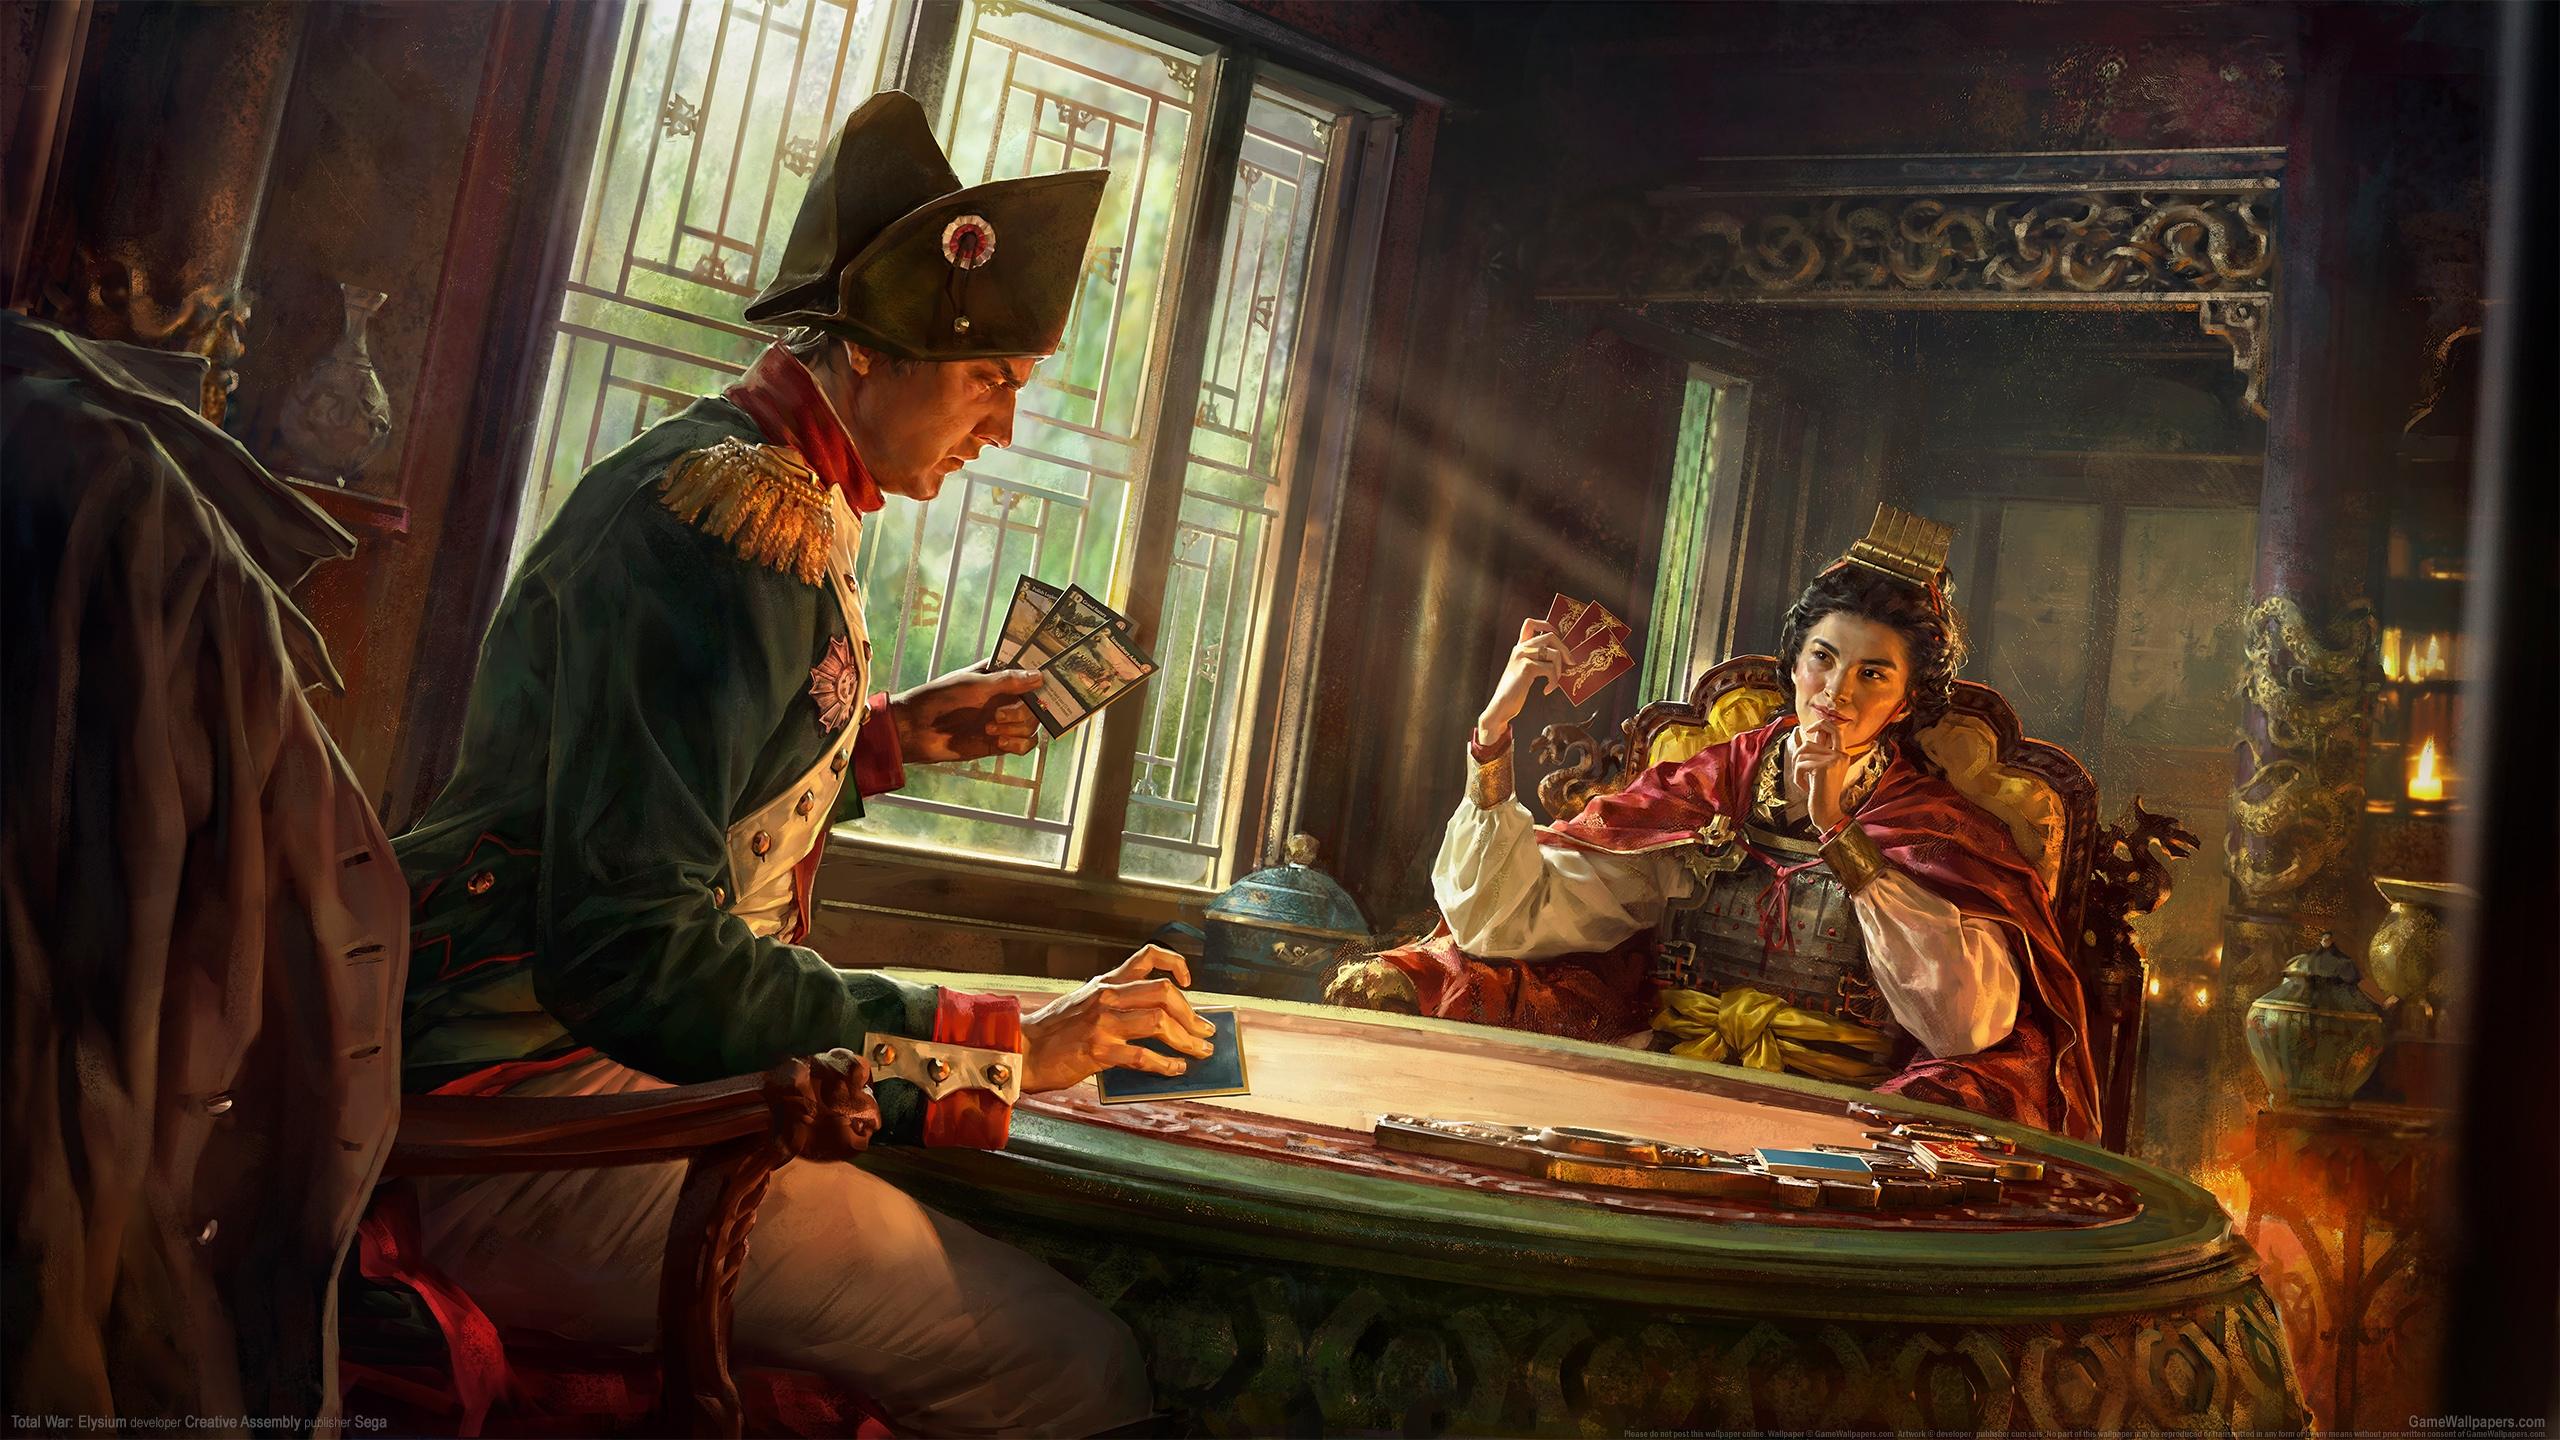 Total War: Elysium 2560x1440 wallpaper or background 01